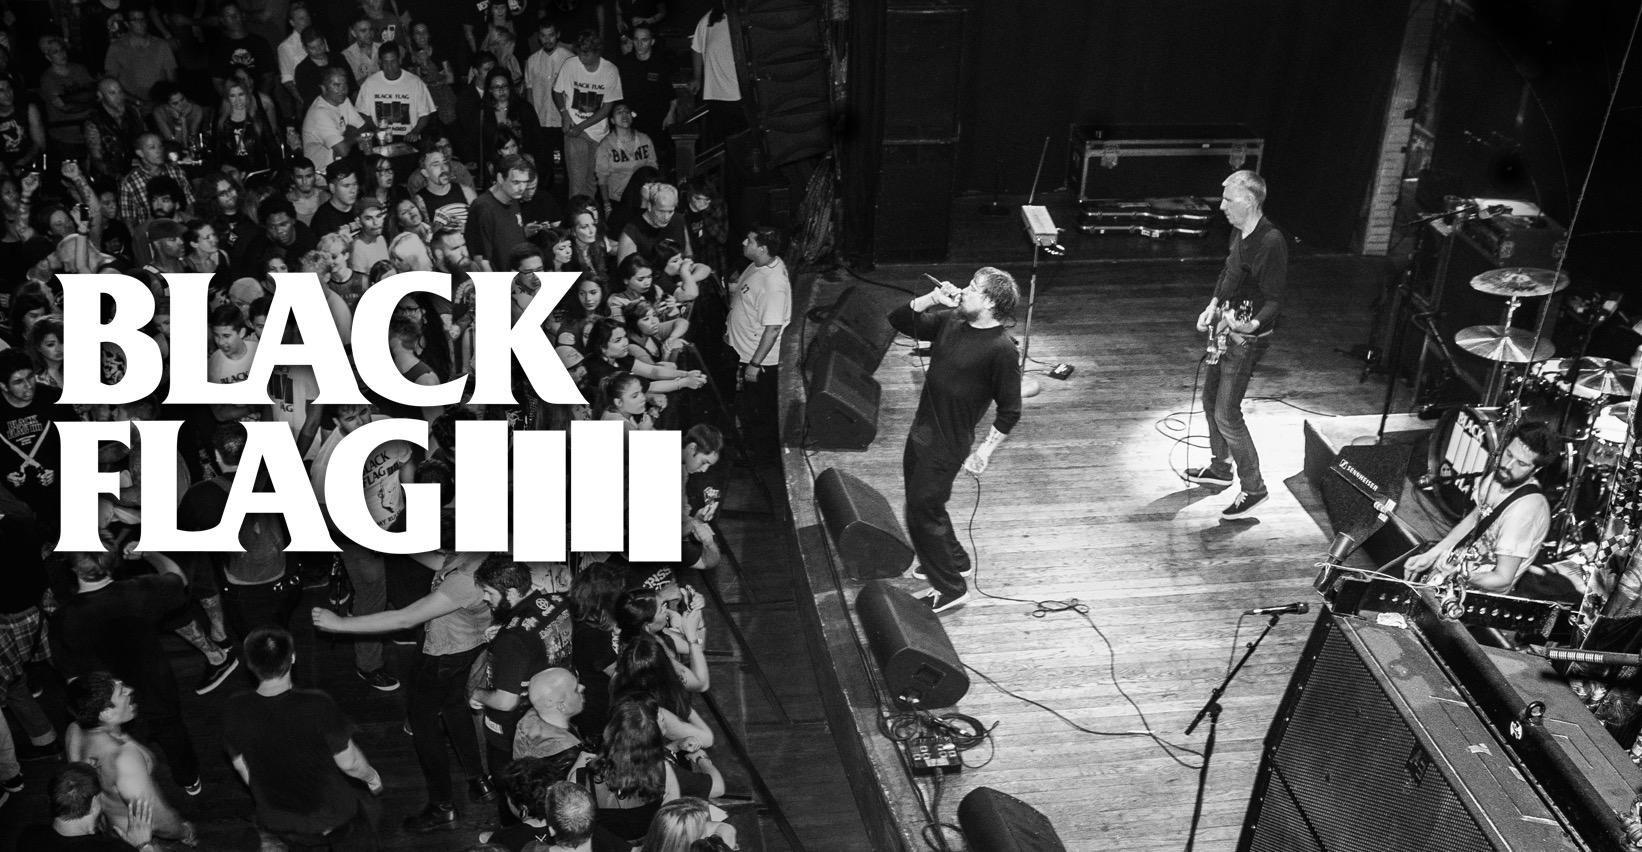 Gana un M&G con Black Flag